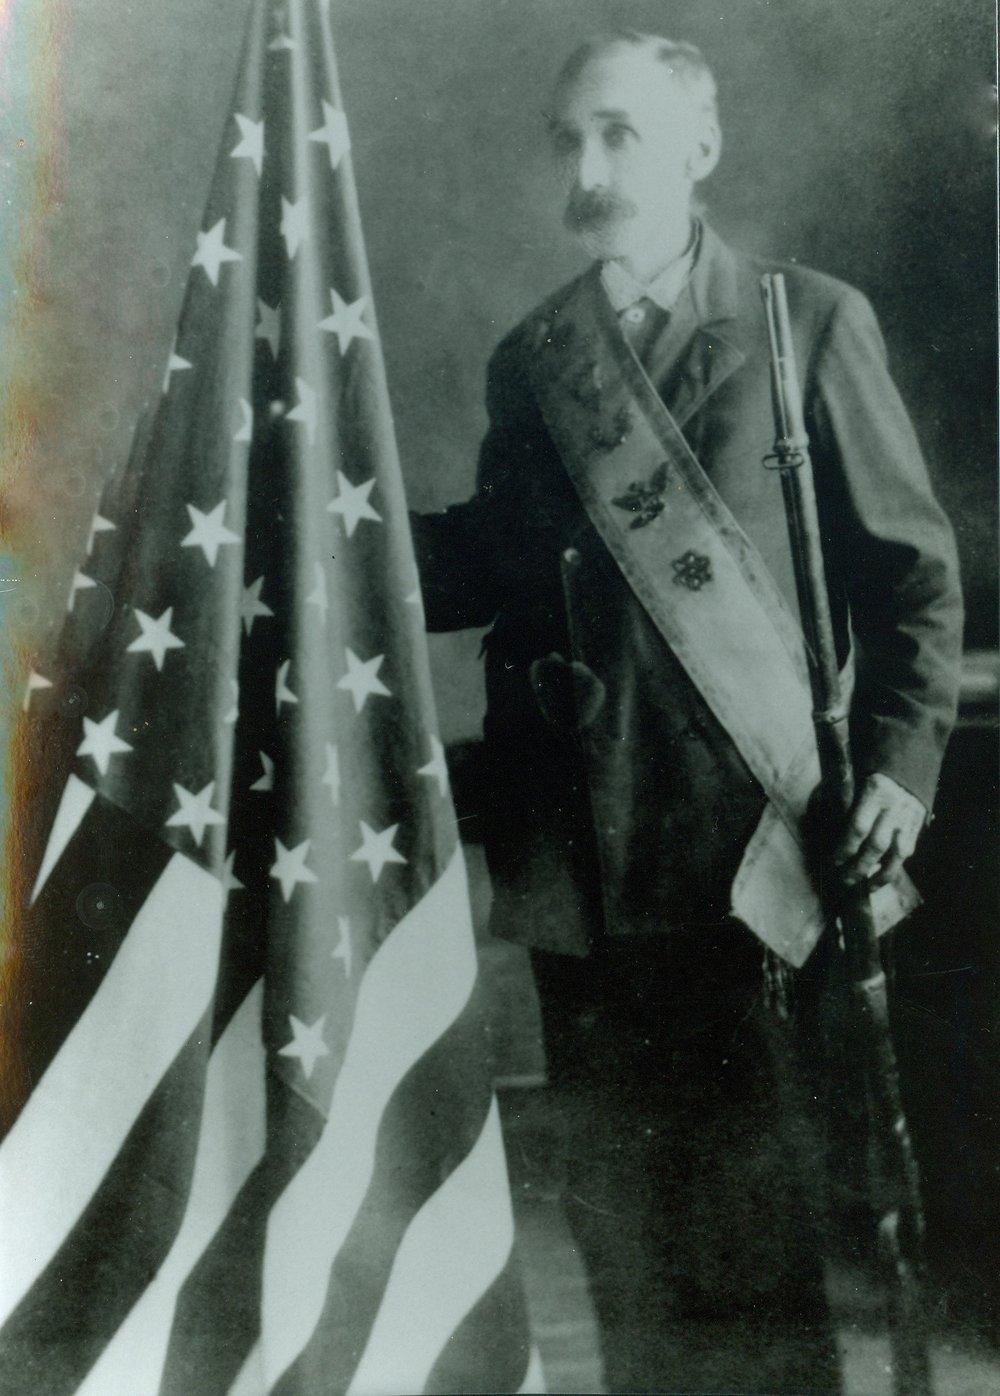 Matthew McFarlane 1839-1917